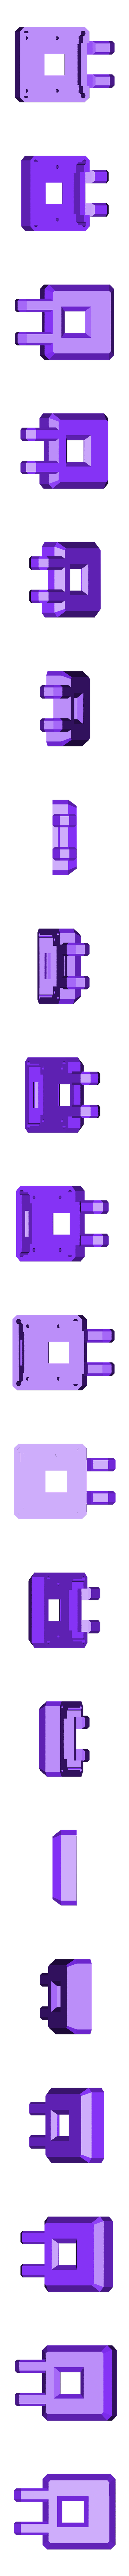 Anycubic_Mega-S_camera_enclosure_front.stl Download free STL file Anycubic I3 Mega Raspberry Pi Camera Mount - Remix • Design to 3D print, nik101968